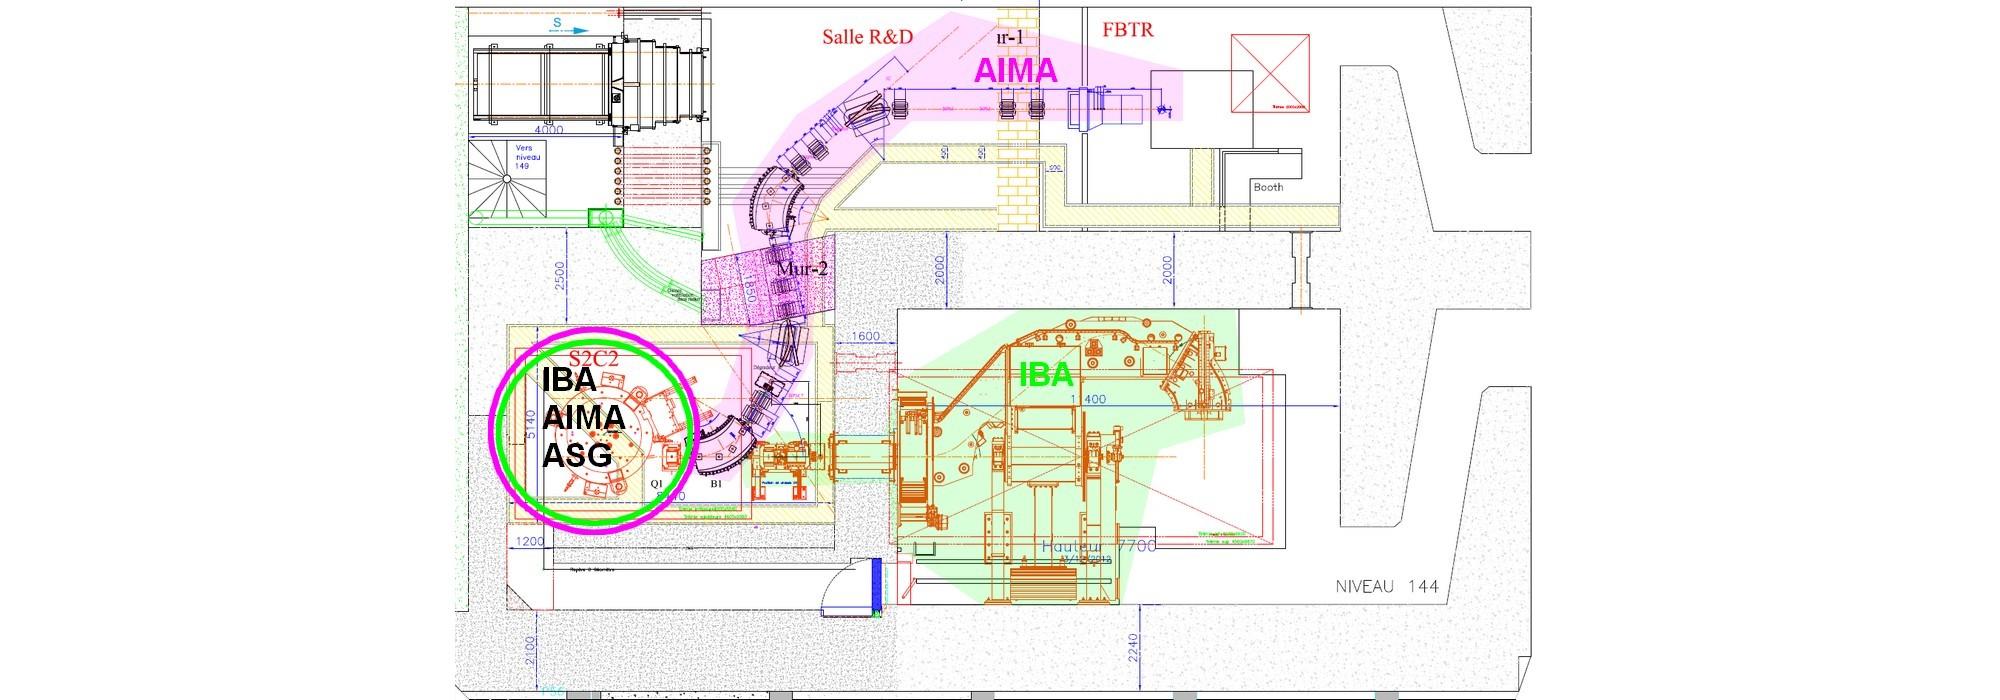 CAL layout